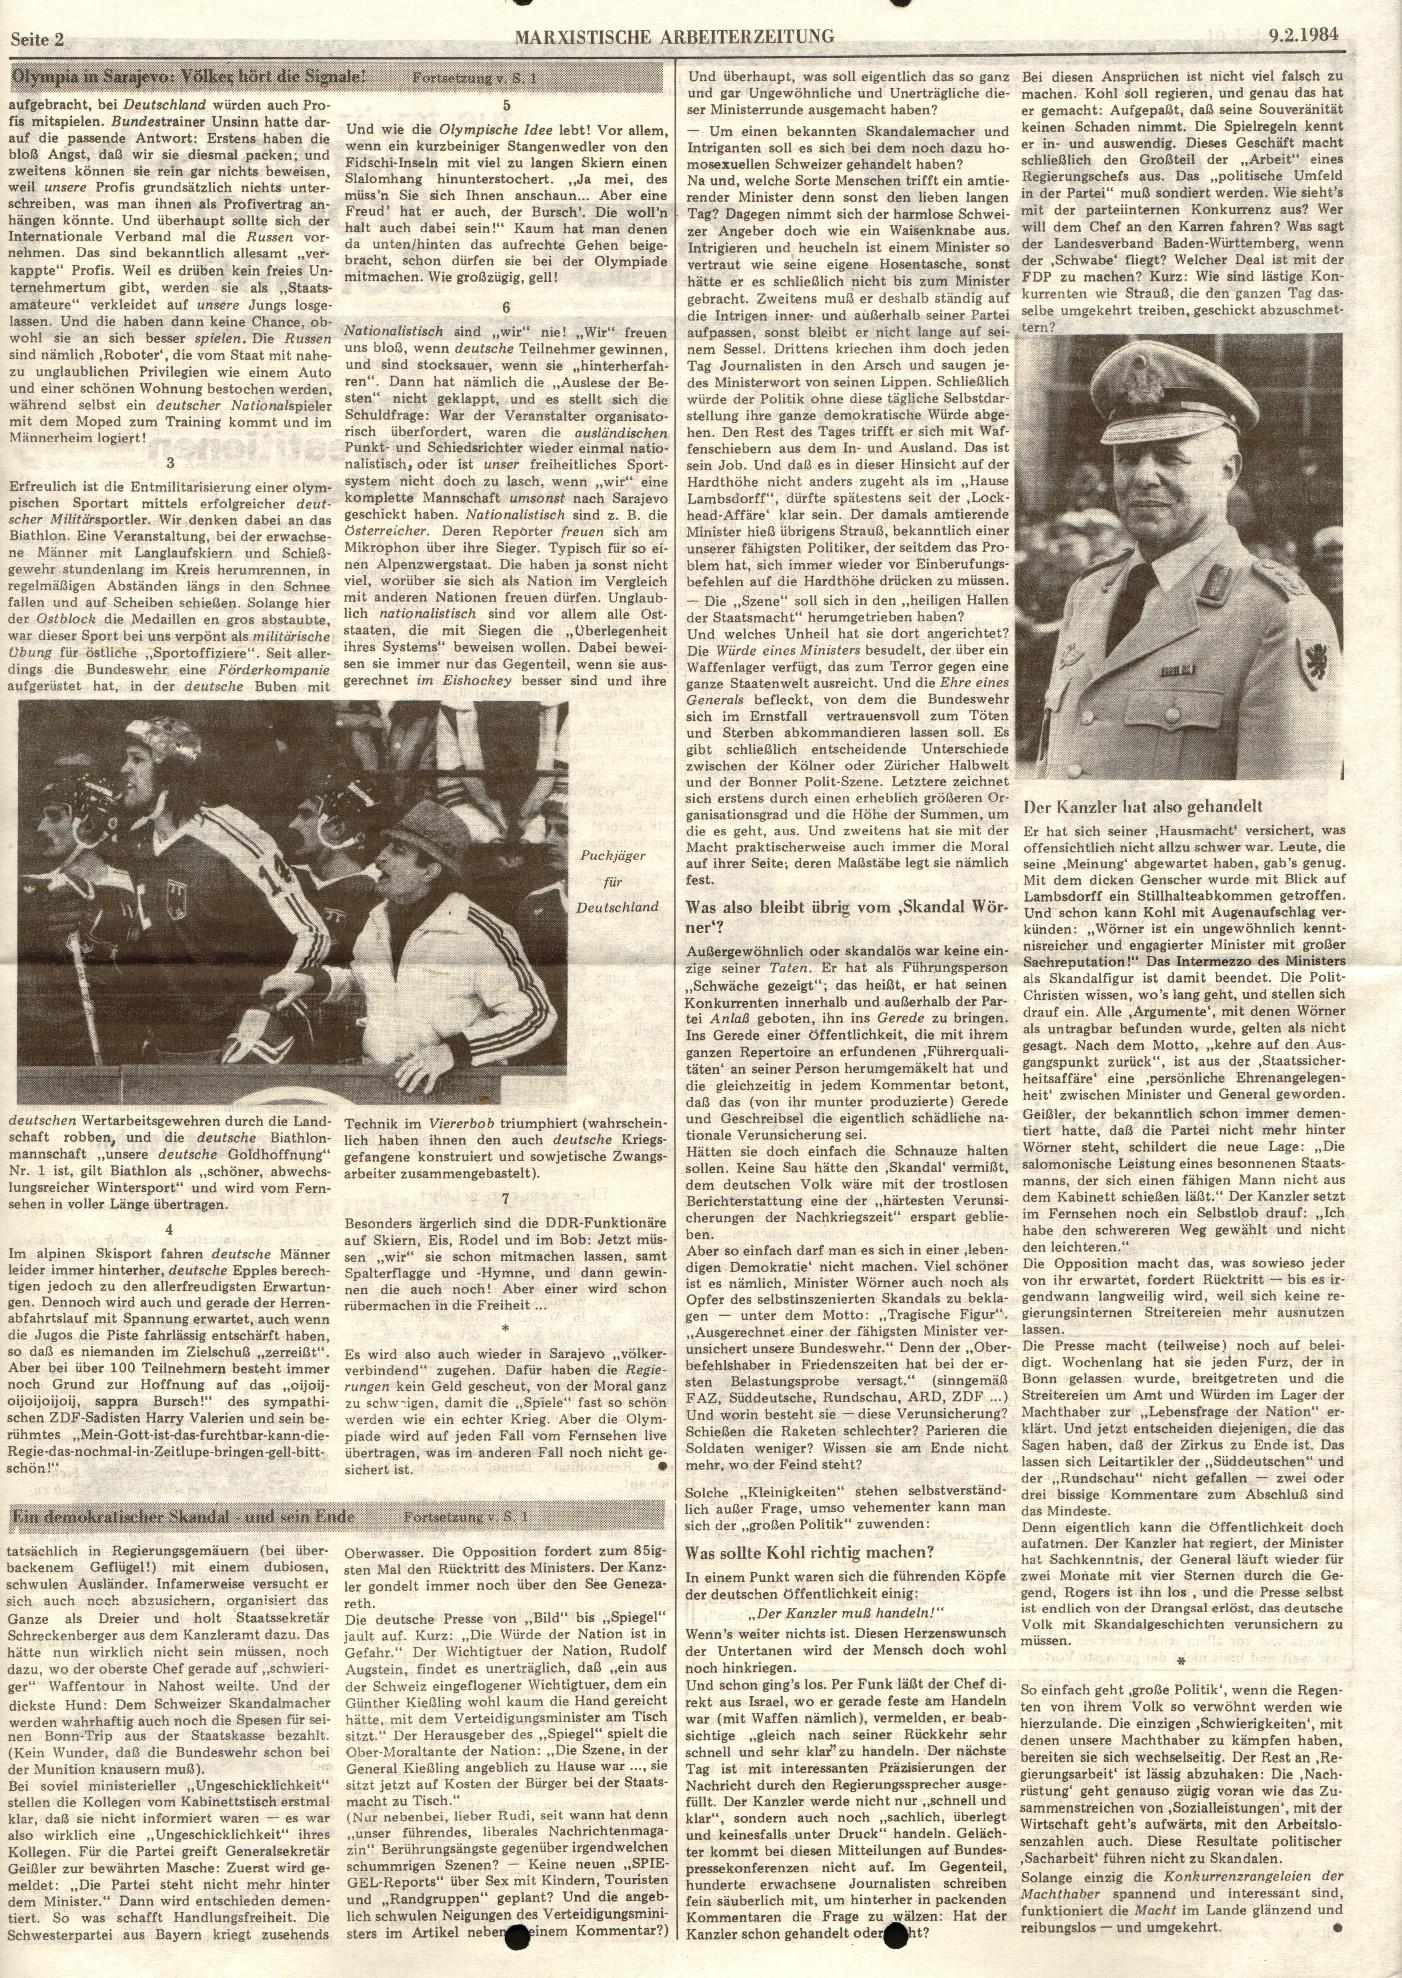 Ruesselsheim_MG_Marxistische_Arbeiterzeitung_Opel_19840210_02